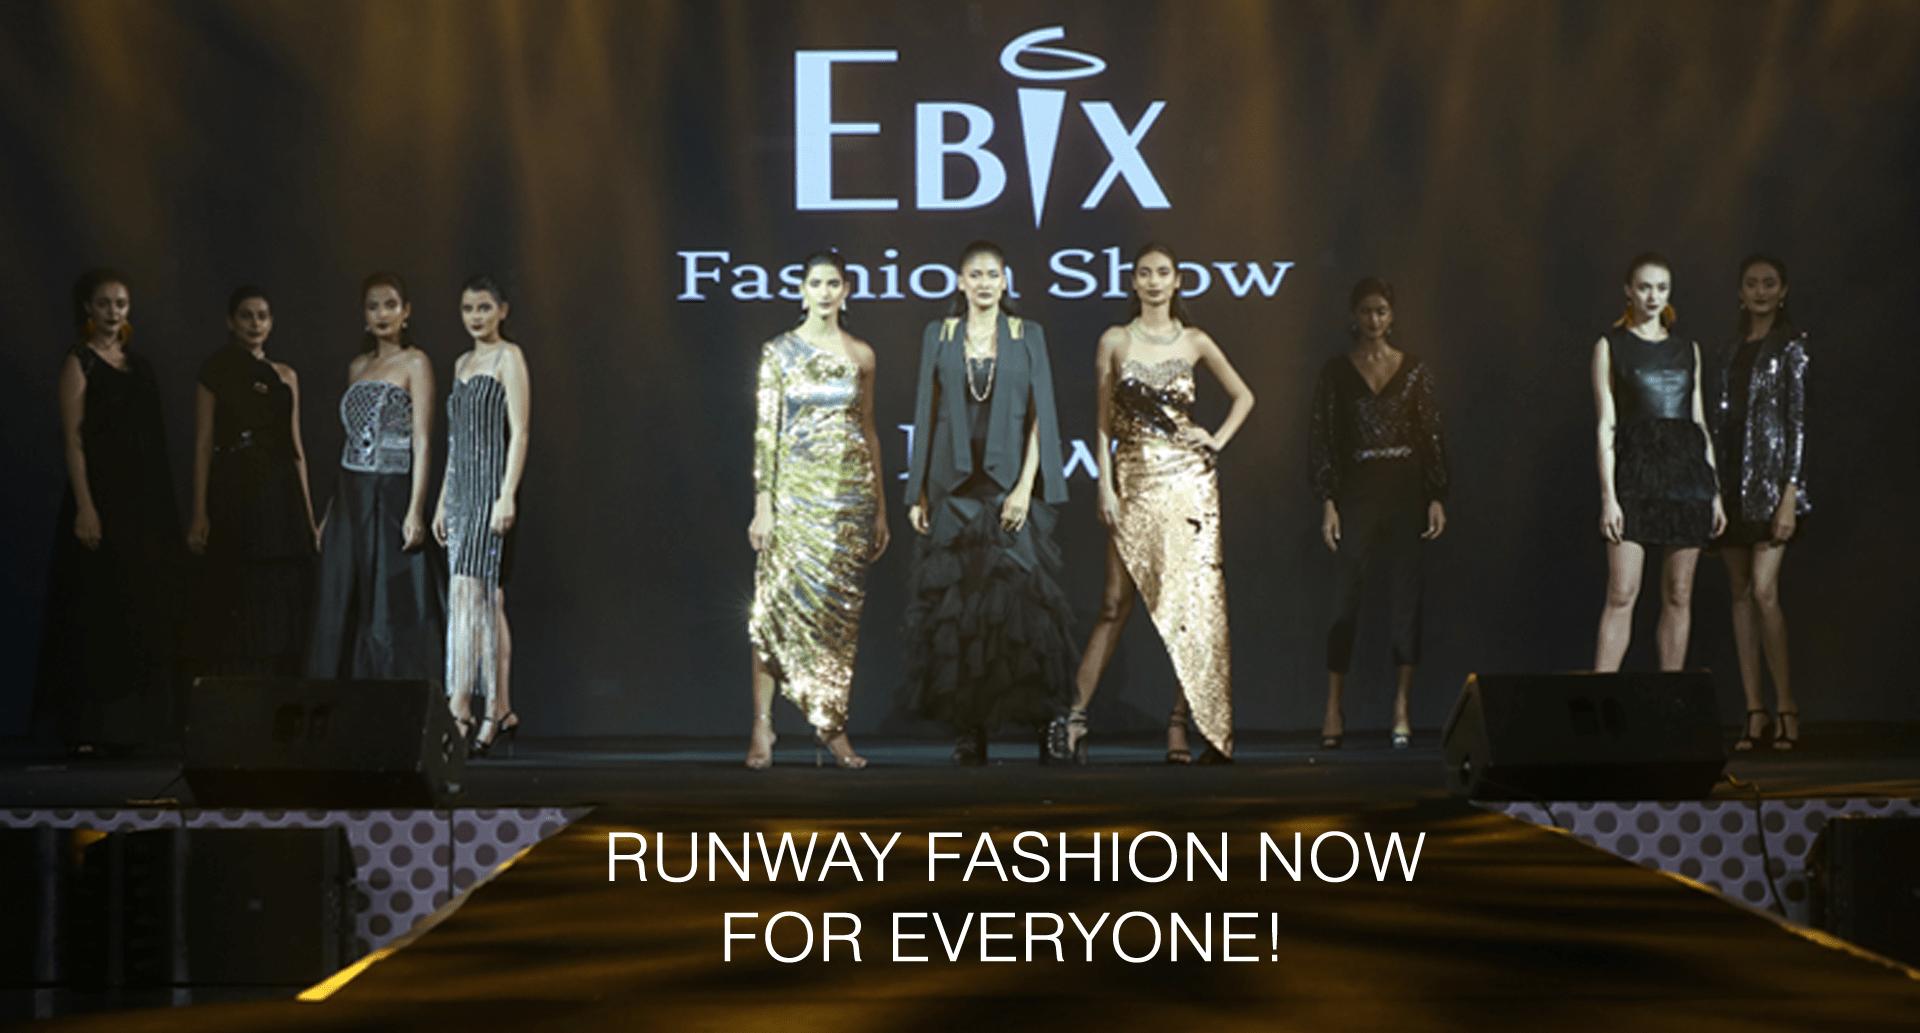 EBIX Fashion Show